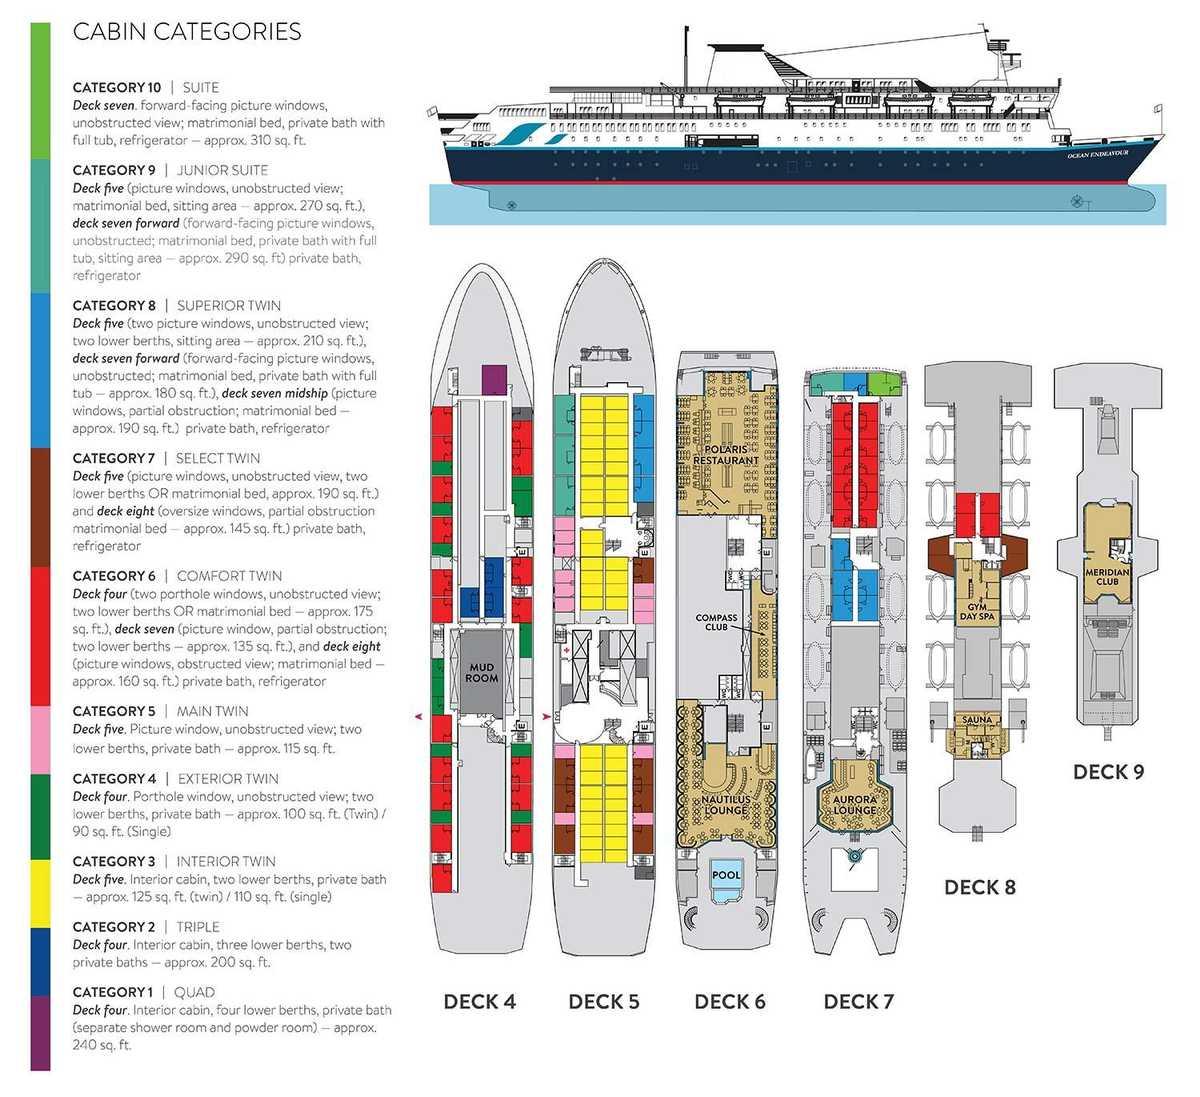 Deckplan-Ocean_Endeavour_Adventure_Canada_New2